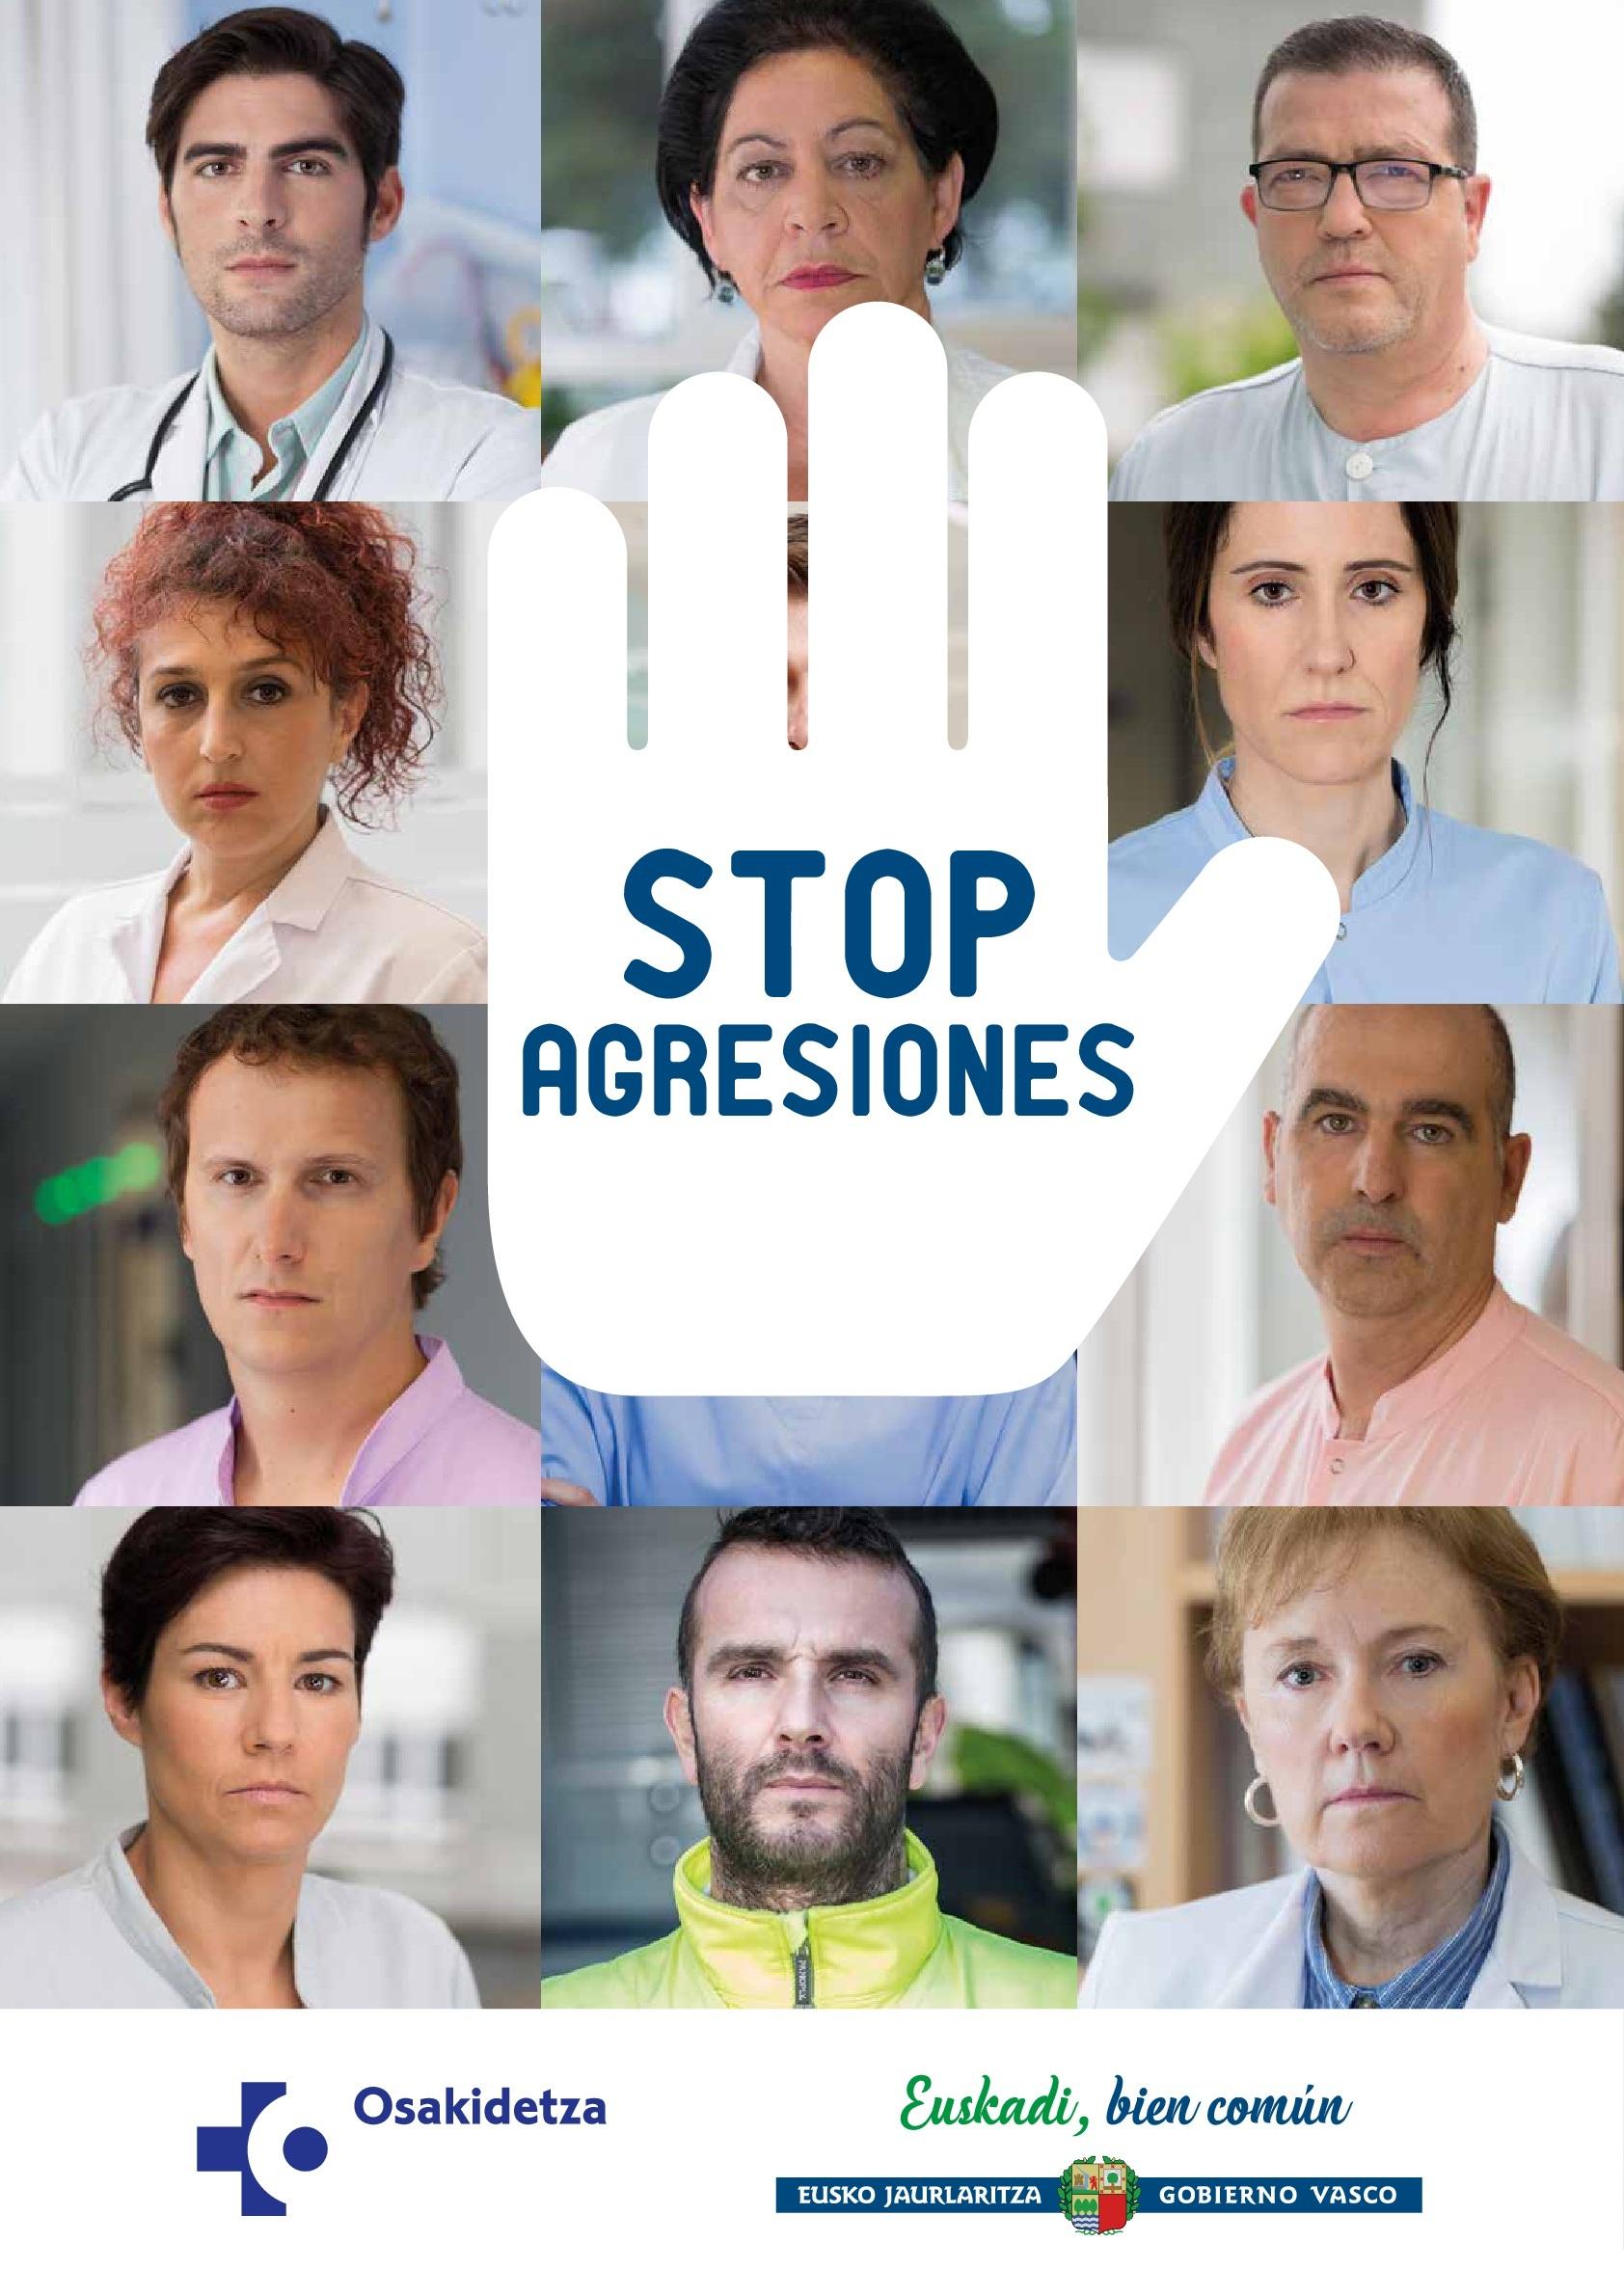 cartel_STOP_agresiones.jpg